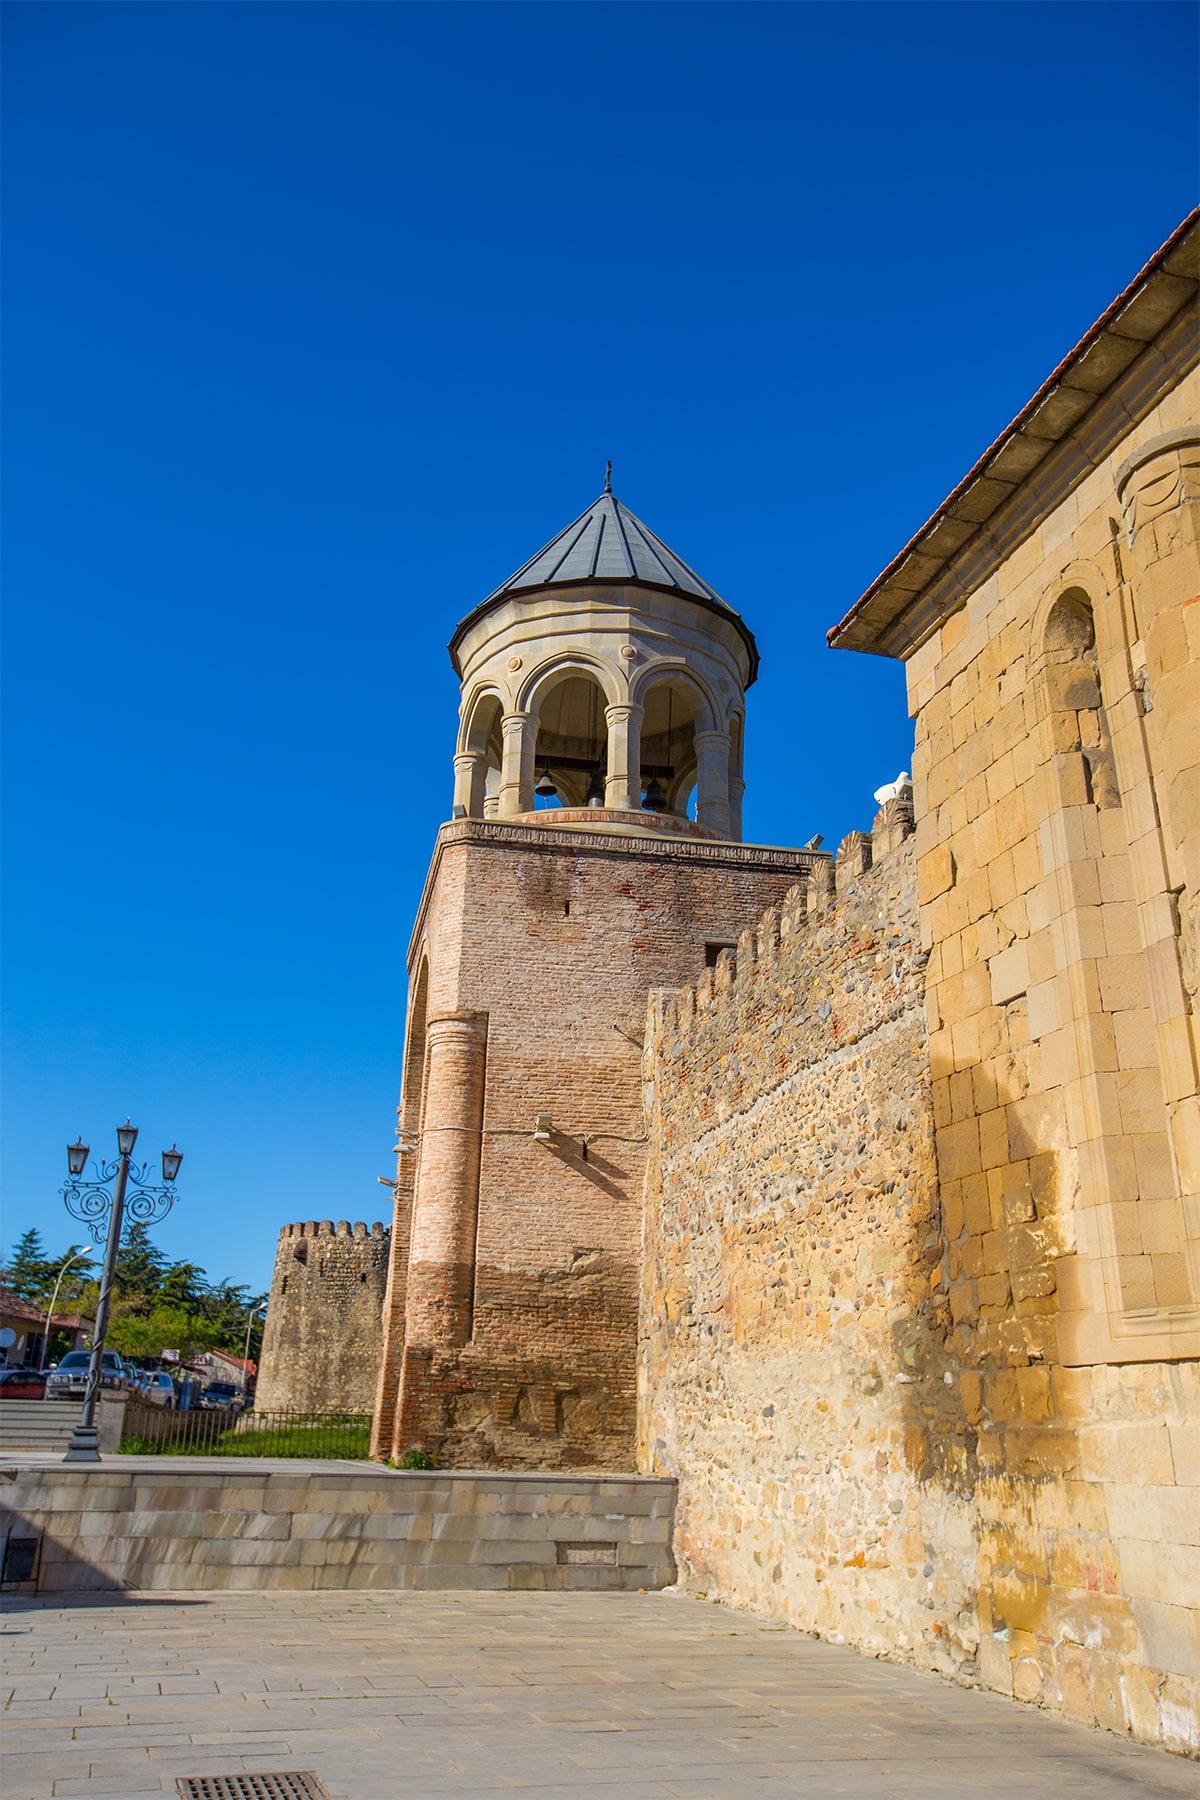 Cathedral walls in Mtskheta Georgia